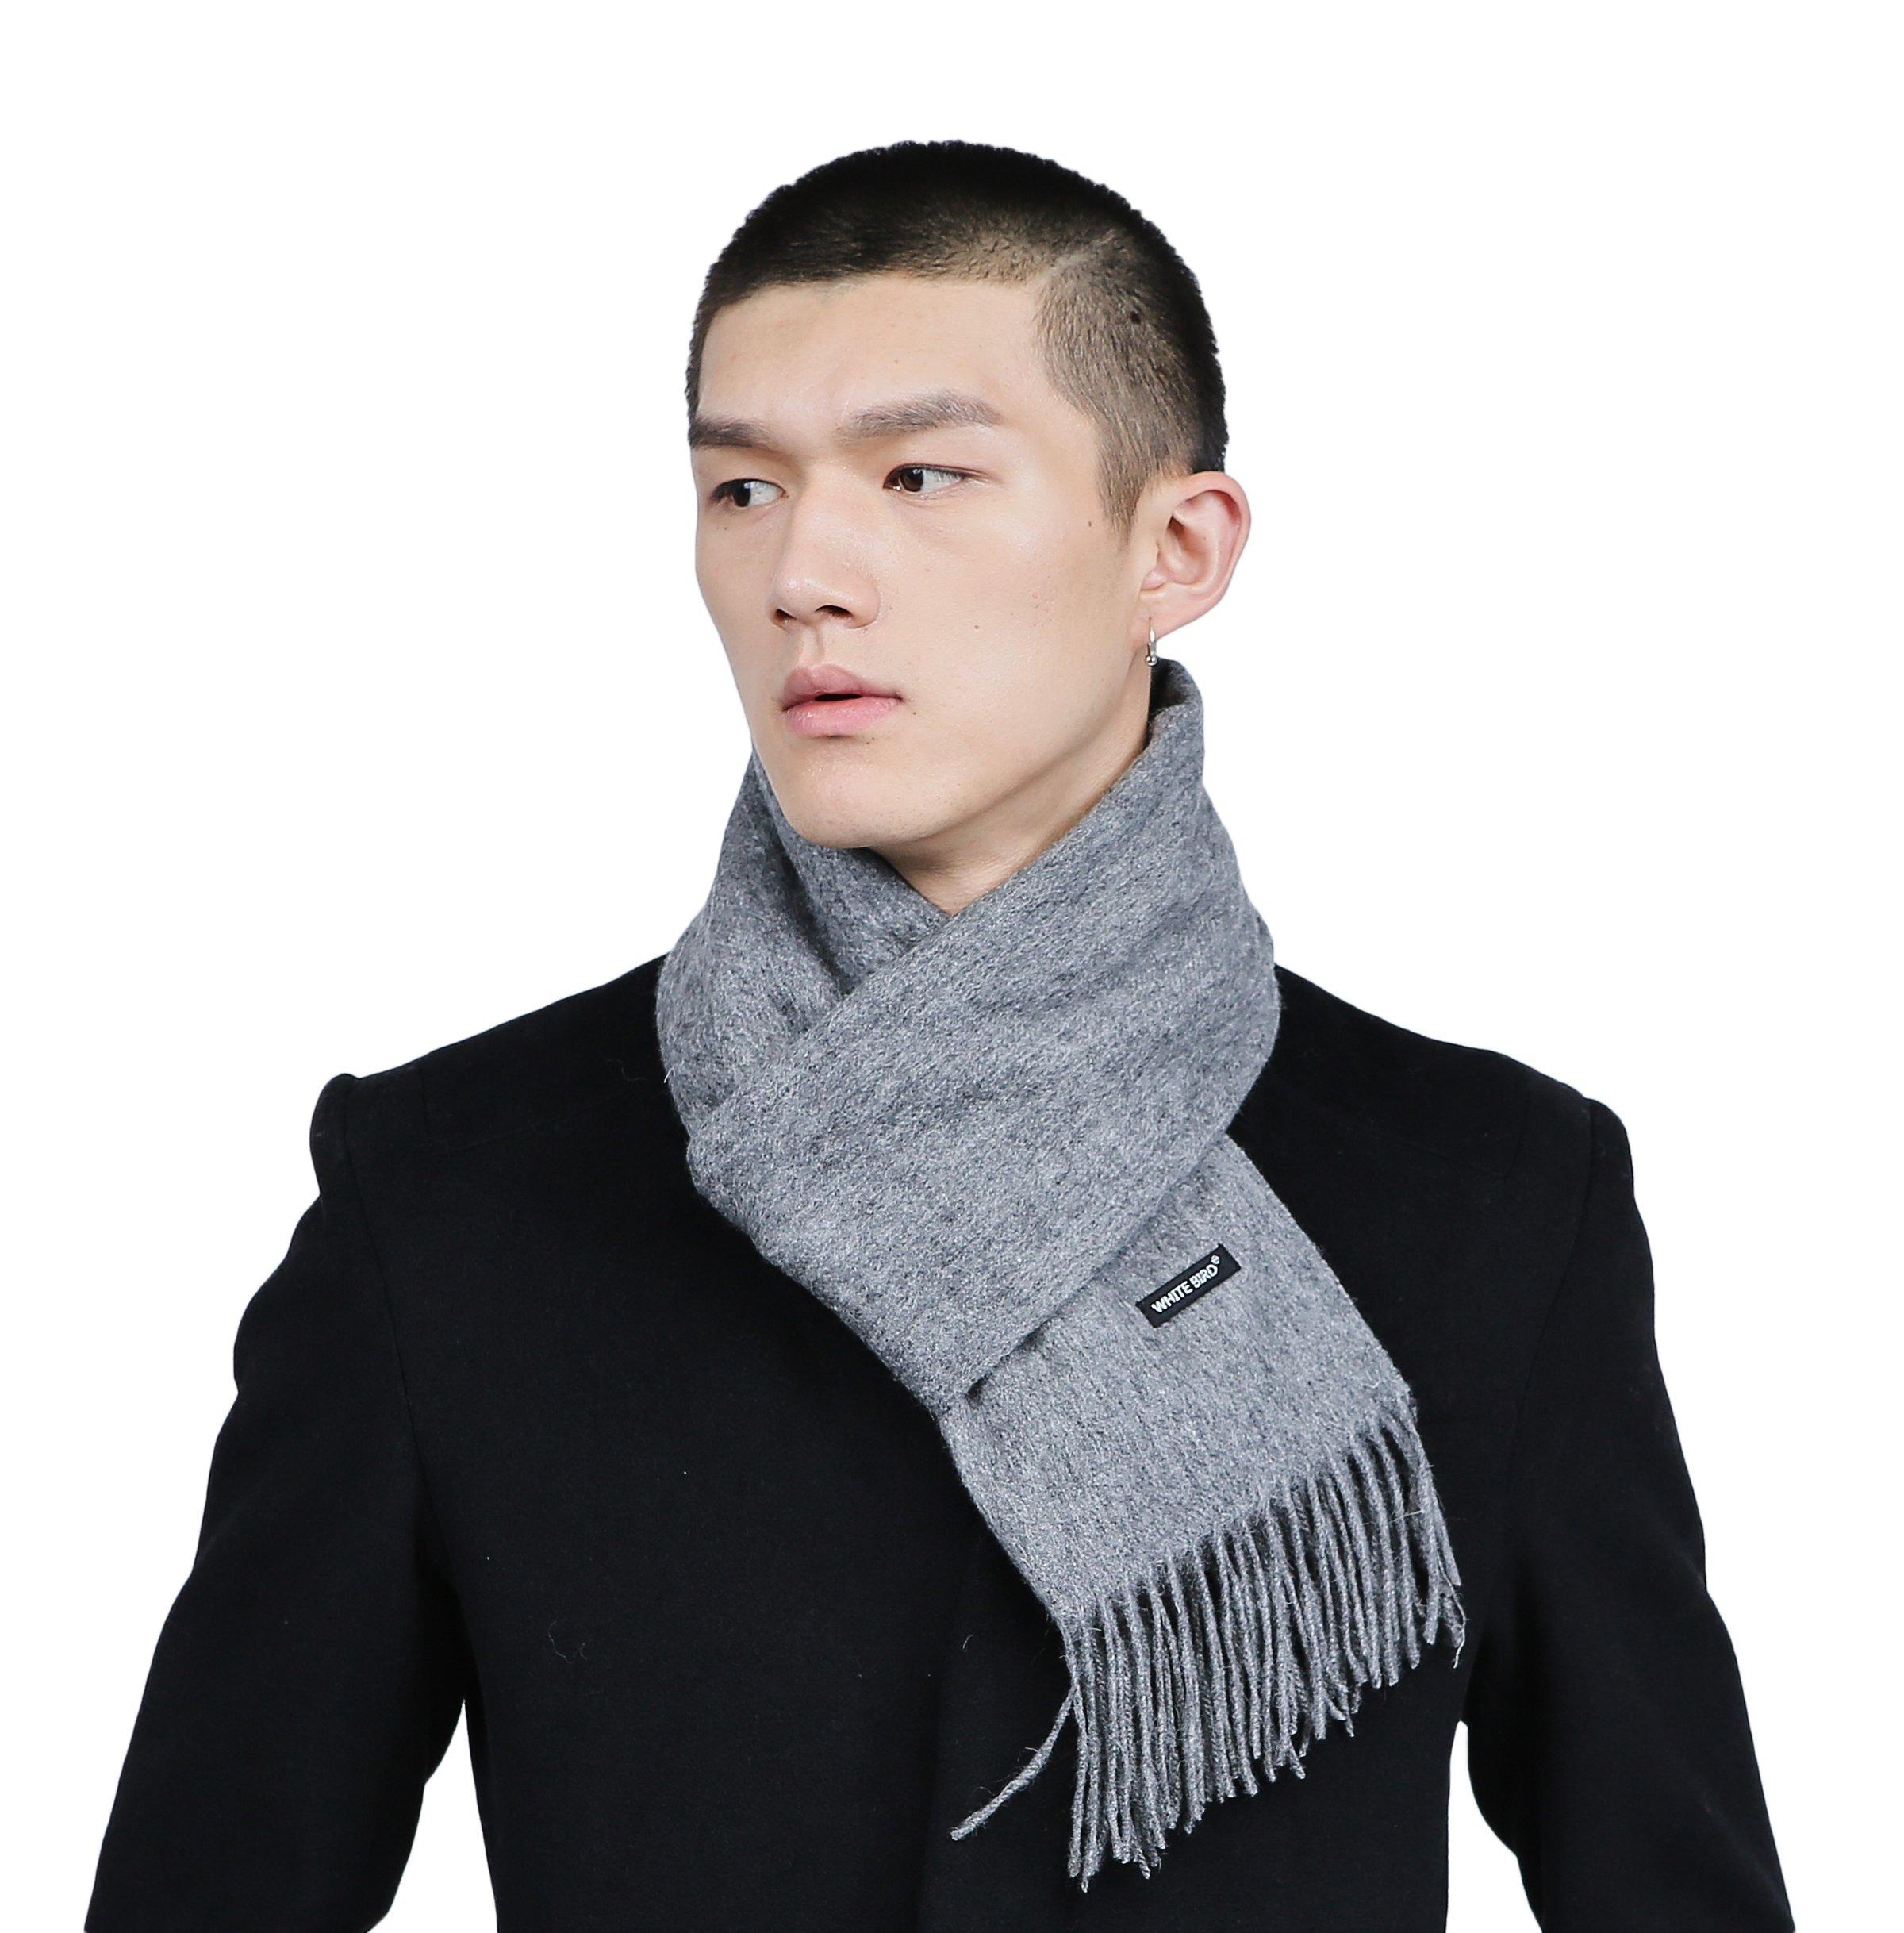 Men's Merino Wool Blend Solid Scarves Cashmere Feel Scarf with Fringe (Dark gray)